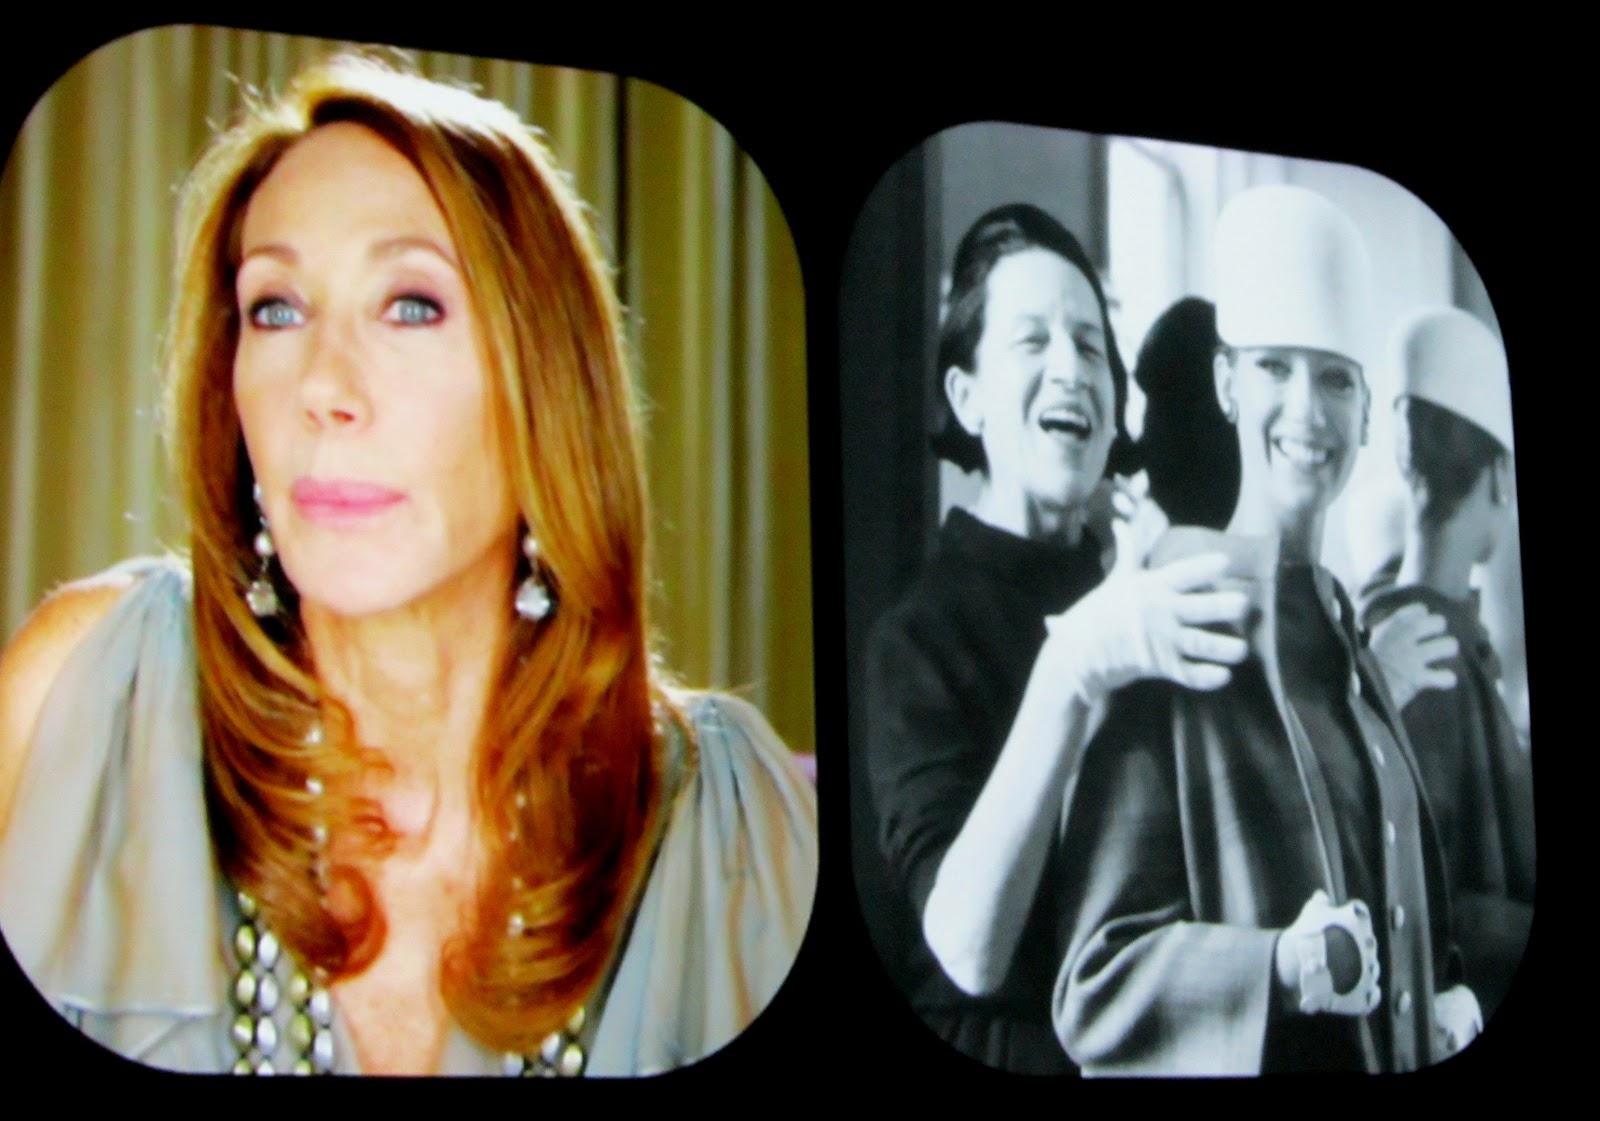 Melissa Peterman,Myrtle Sarrosa (b. 1994) Hot clip Robert Lantos,Jessie Cave (born 1987)